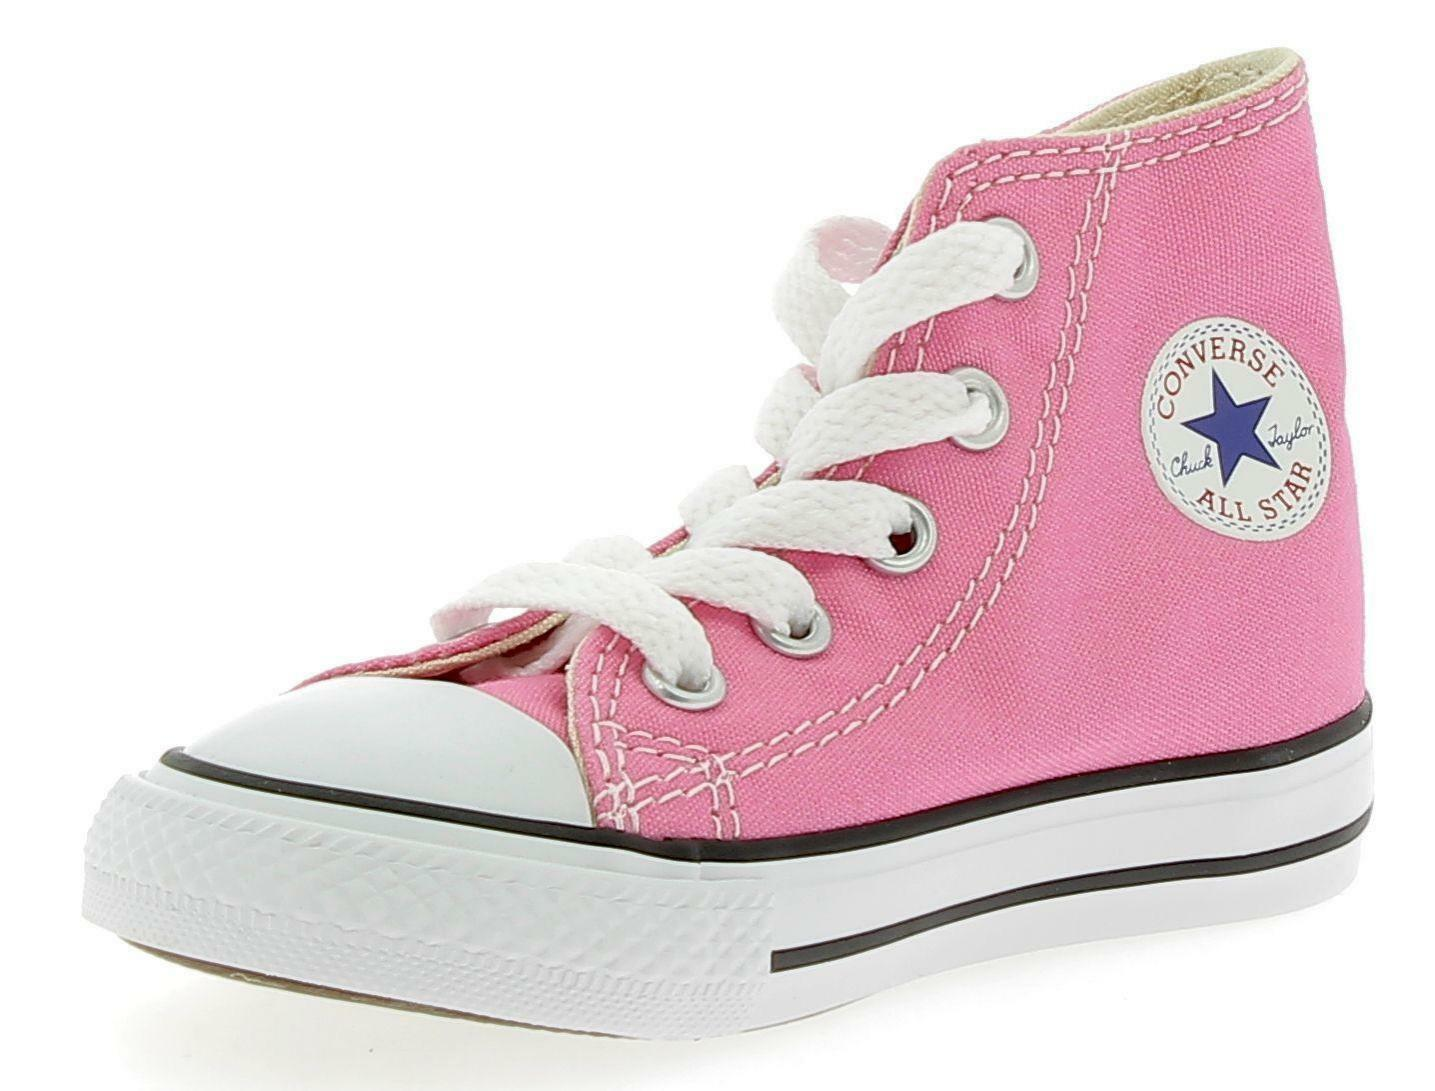 converse converse inft c/t allstar scarpe sportive bambina rosa 7j234c